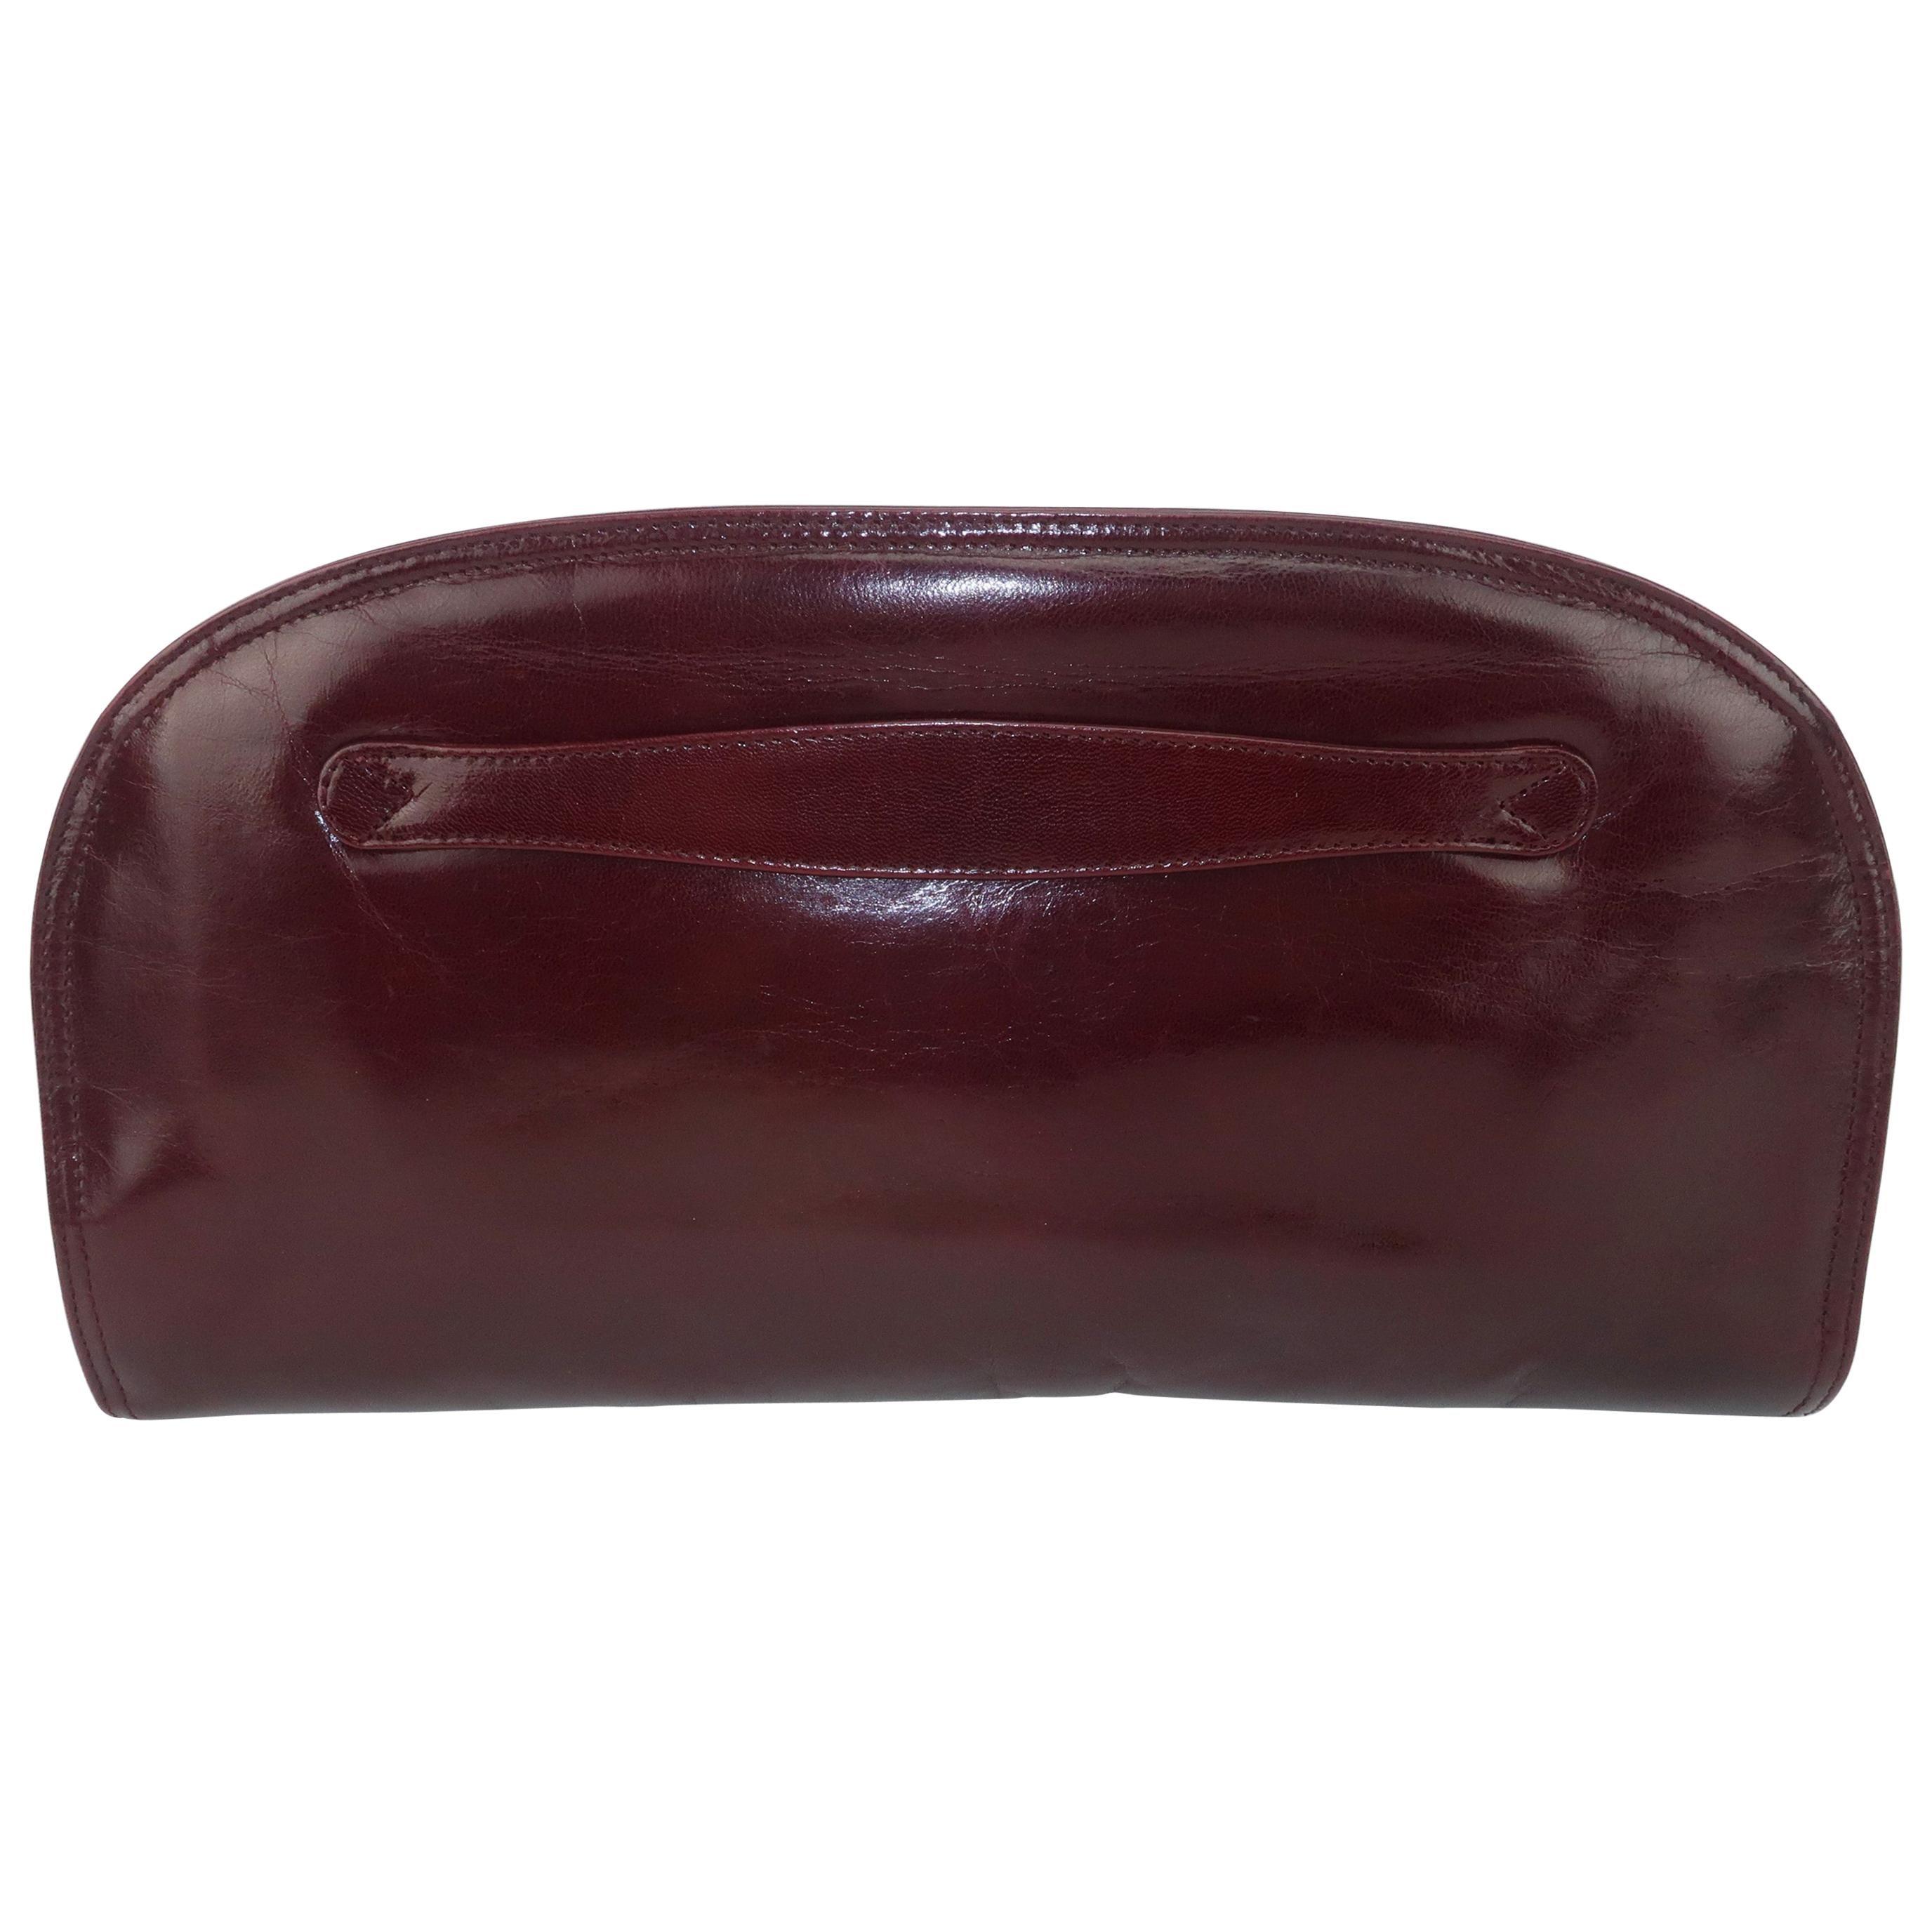 1970's Bottega Veneta Burgundy Leather Clutch Handbag